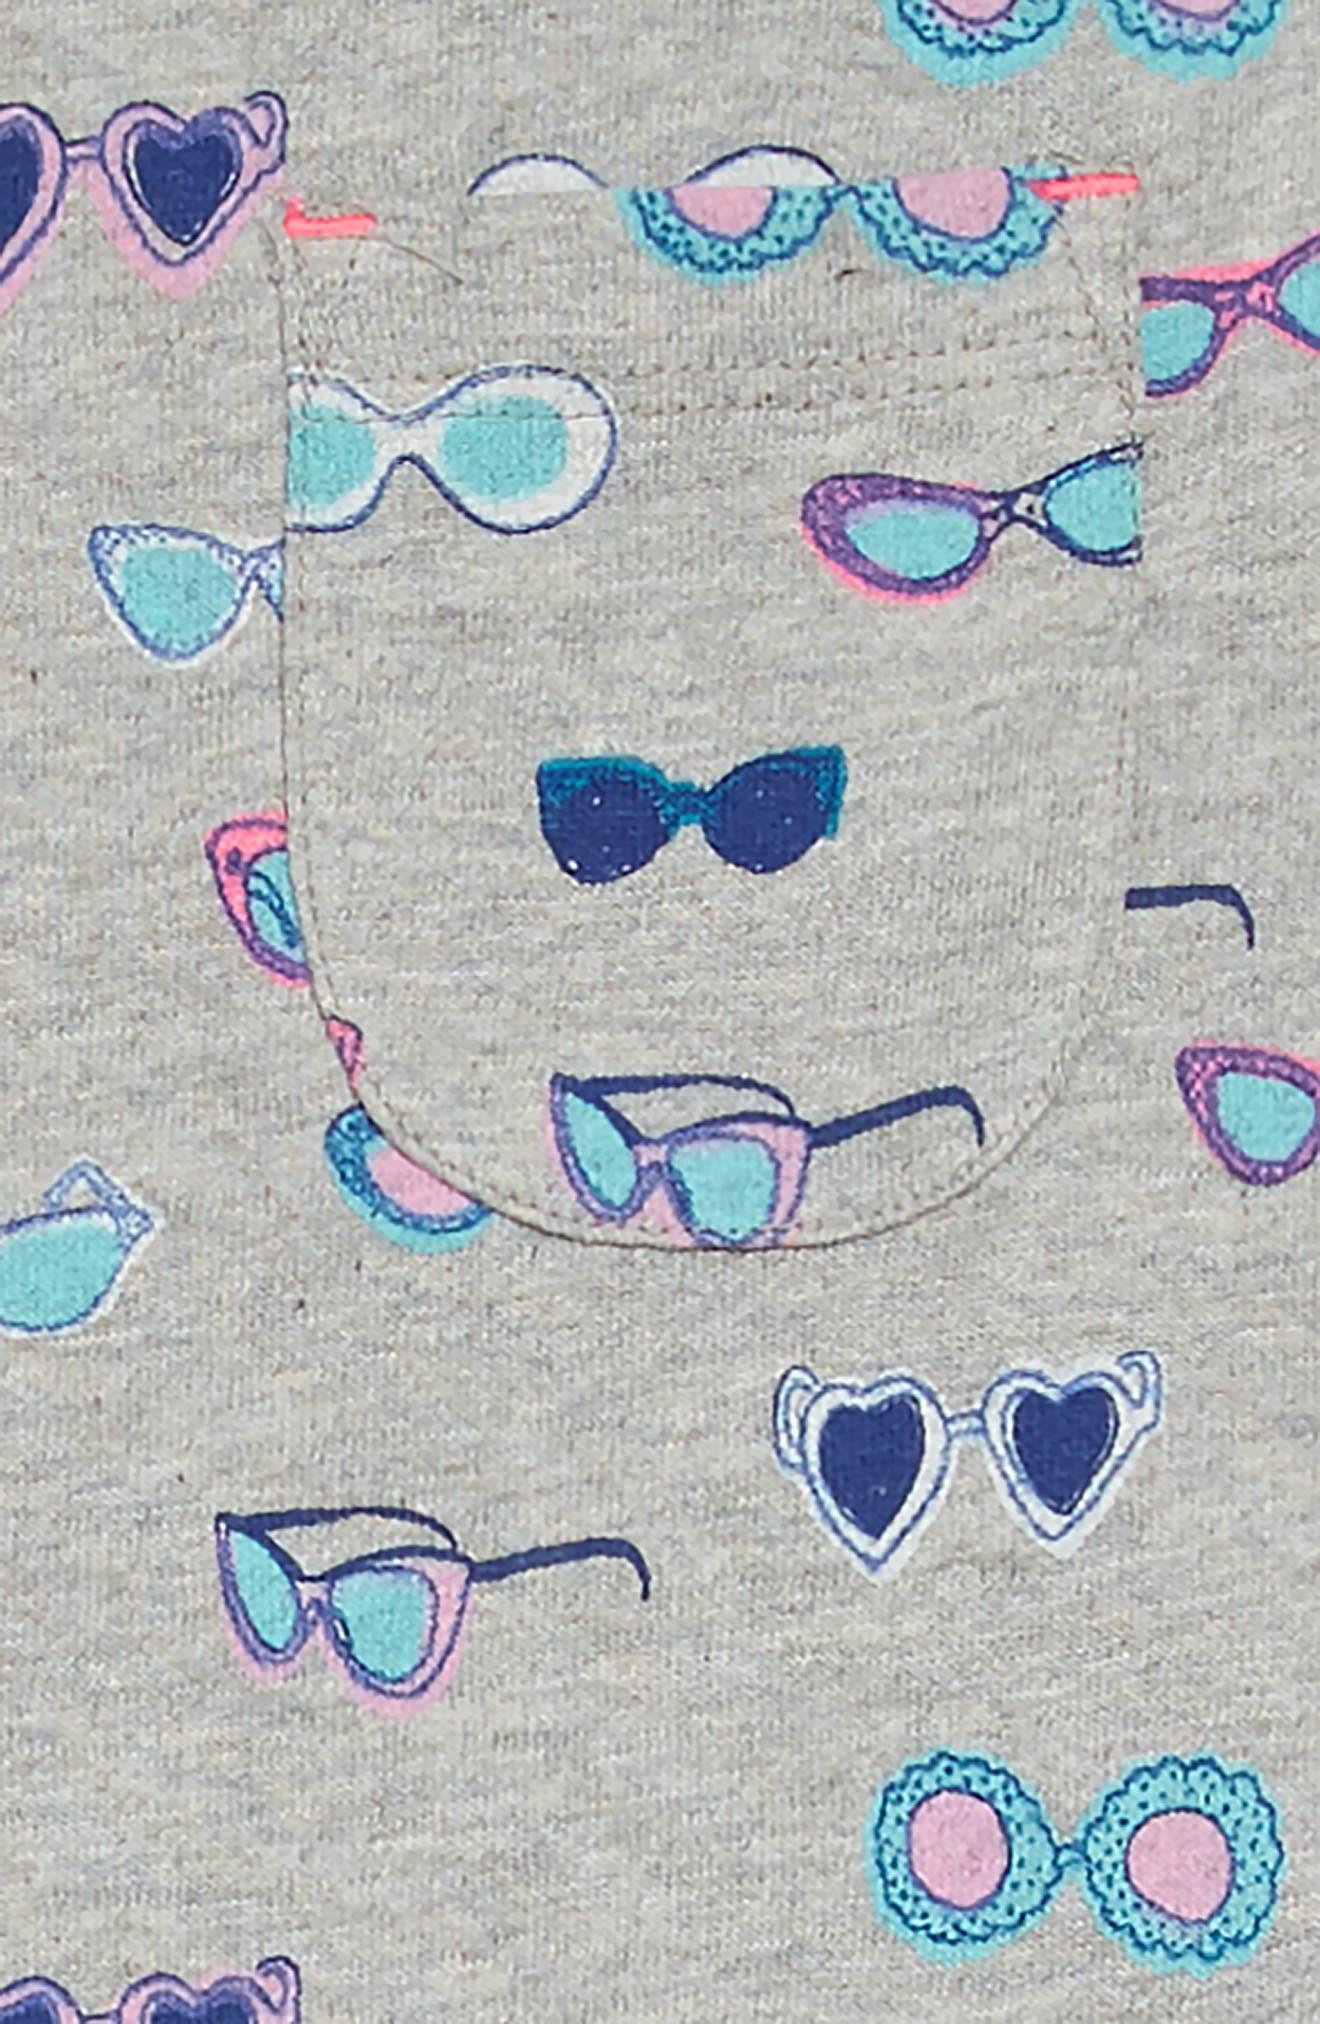 Drop-Waist Jersey Dress,                             Alternate thumbnail 3, color,                             Grey Marl Sunglasses